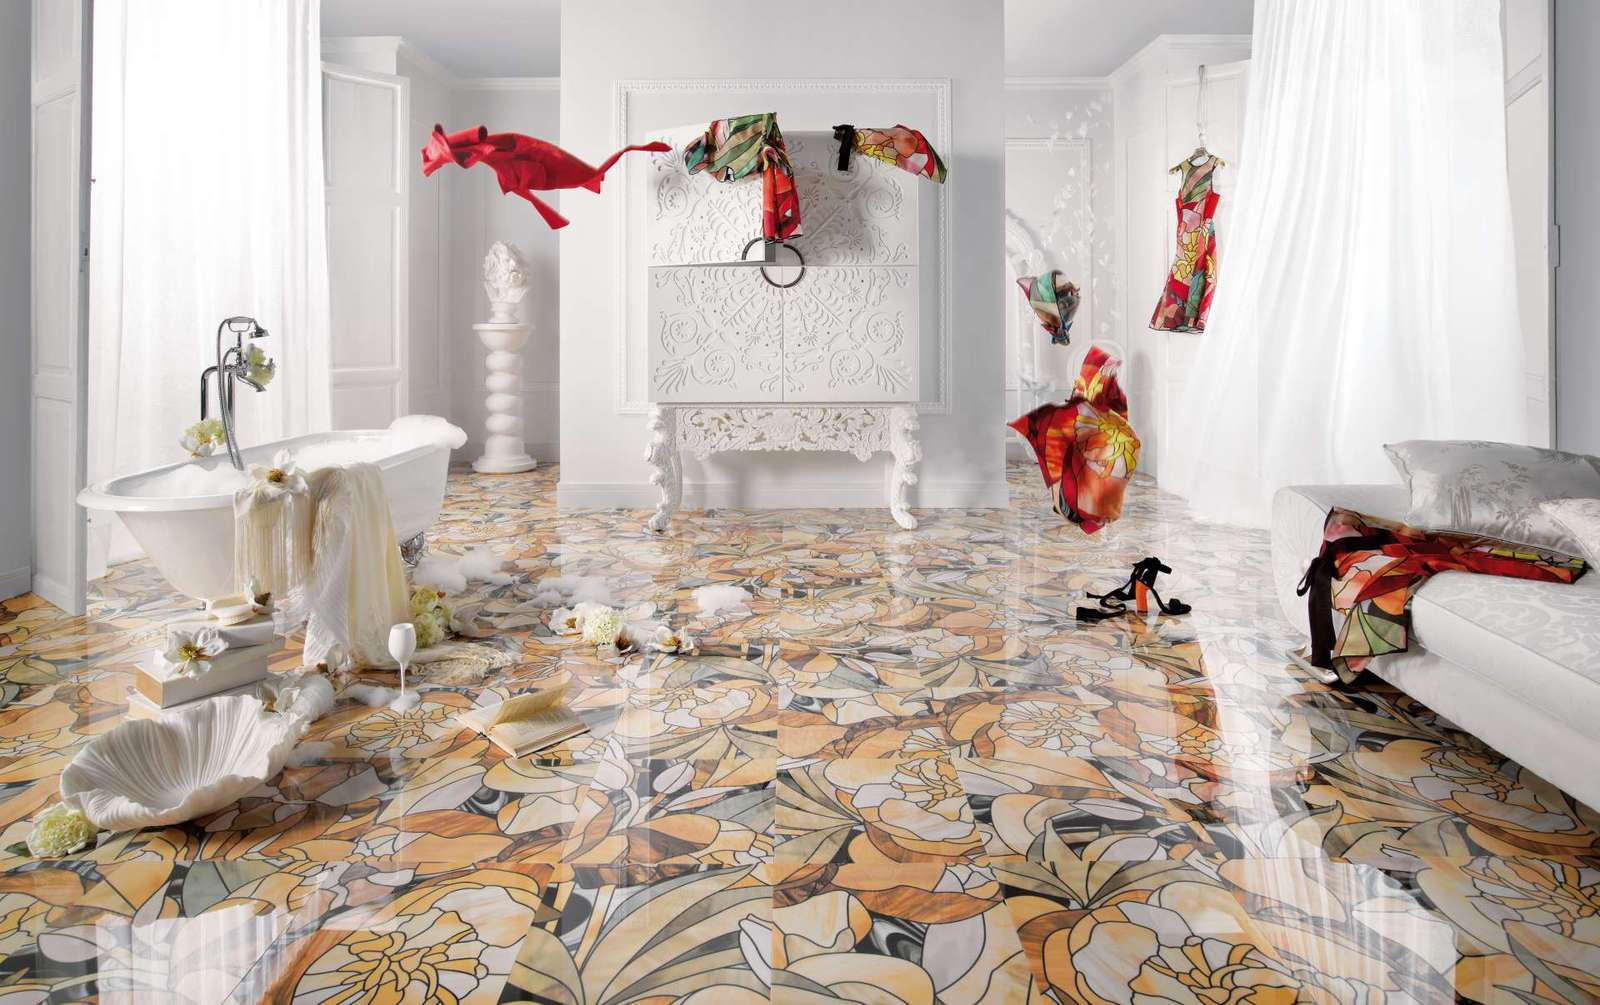 beautiful tile flooring ideas for living room kitchen bathroom designs kitchen tiles floor 25 Beautiful Tile Flooring Ideas for Living Room Kitchen and Bathroom Designs